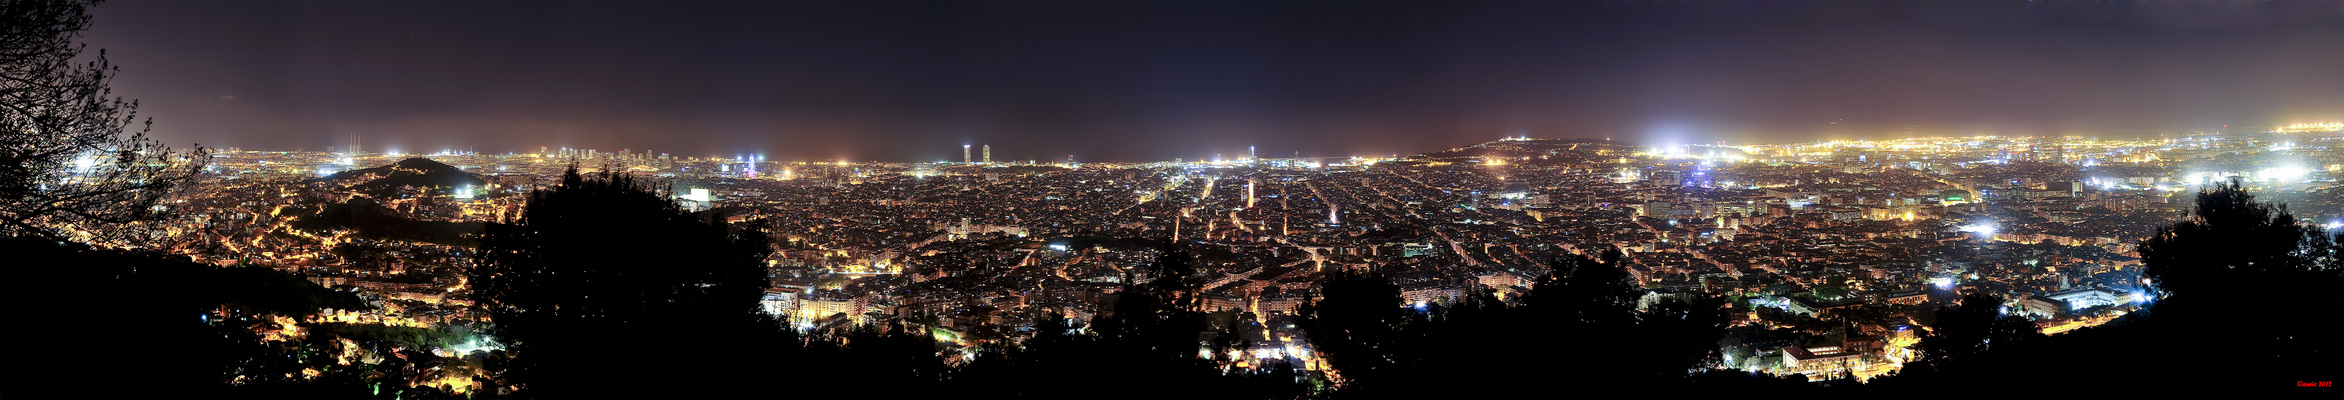 panoramique de Barcelone